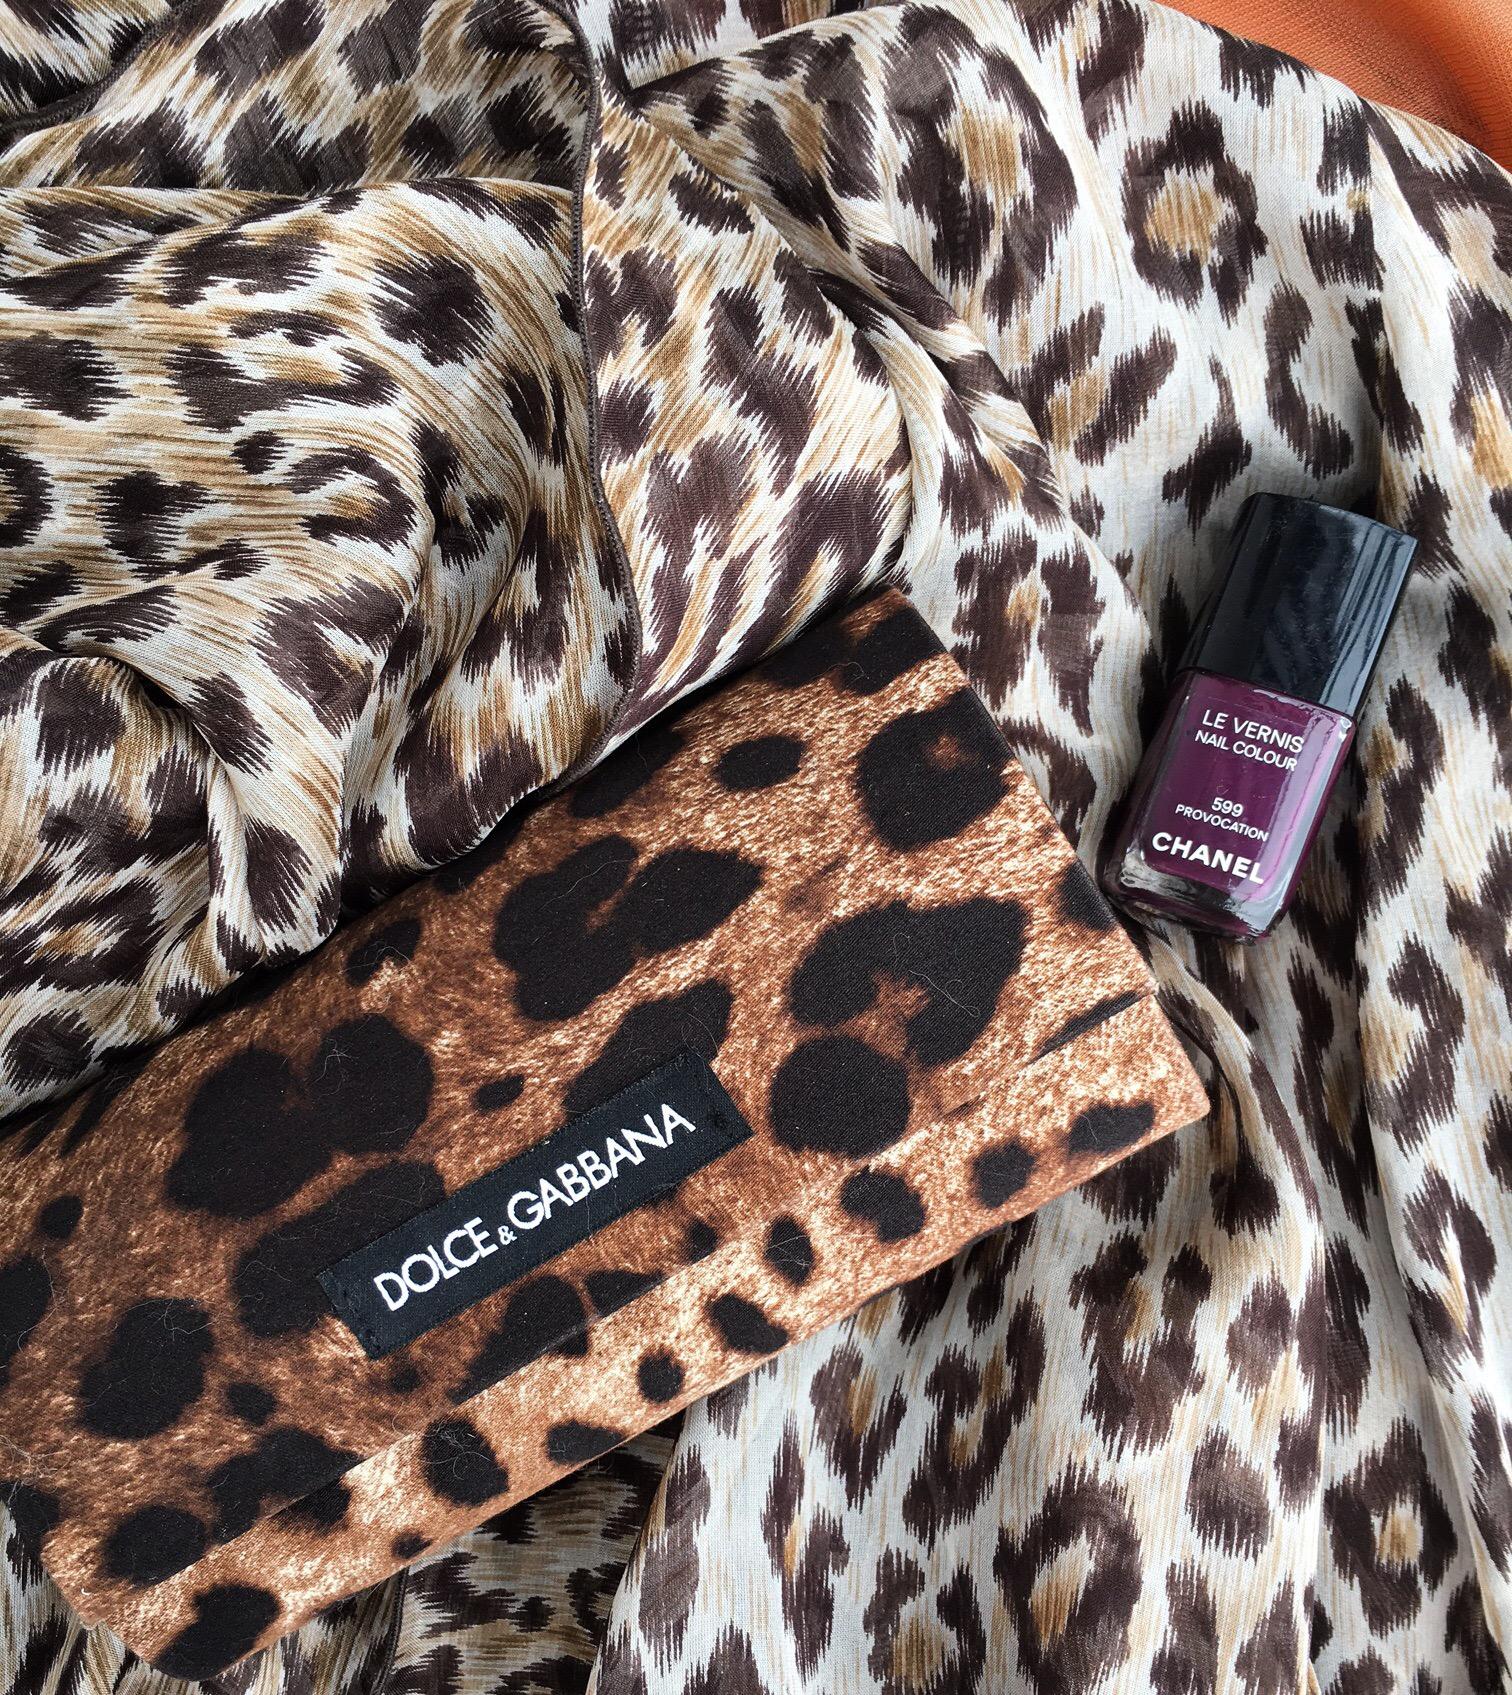 Dolce Gabbana, chanel, Summerlook, dress, leoprint, Chanel